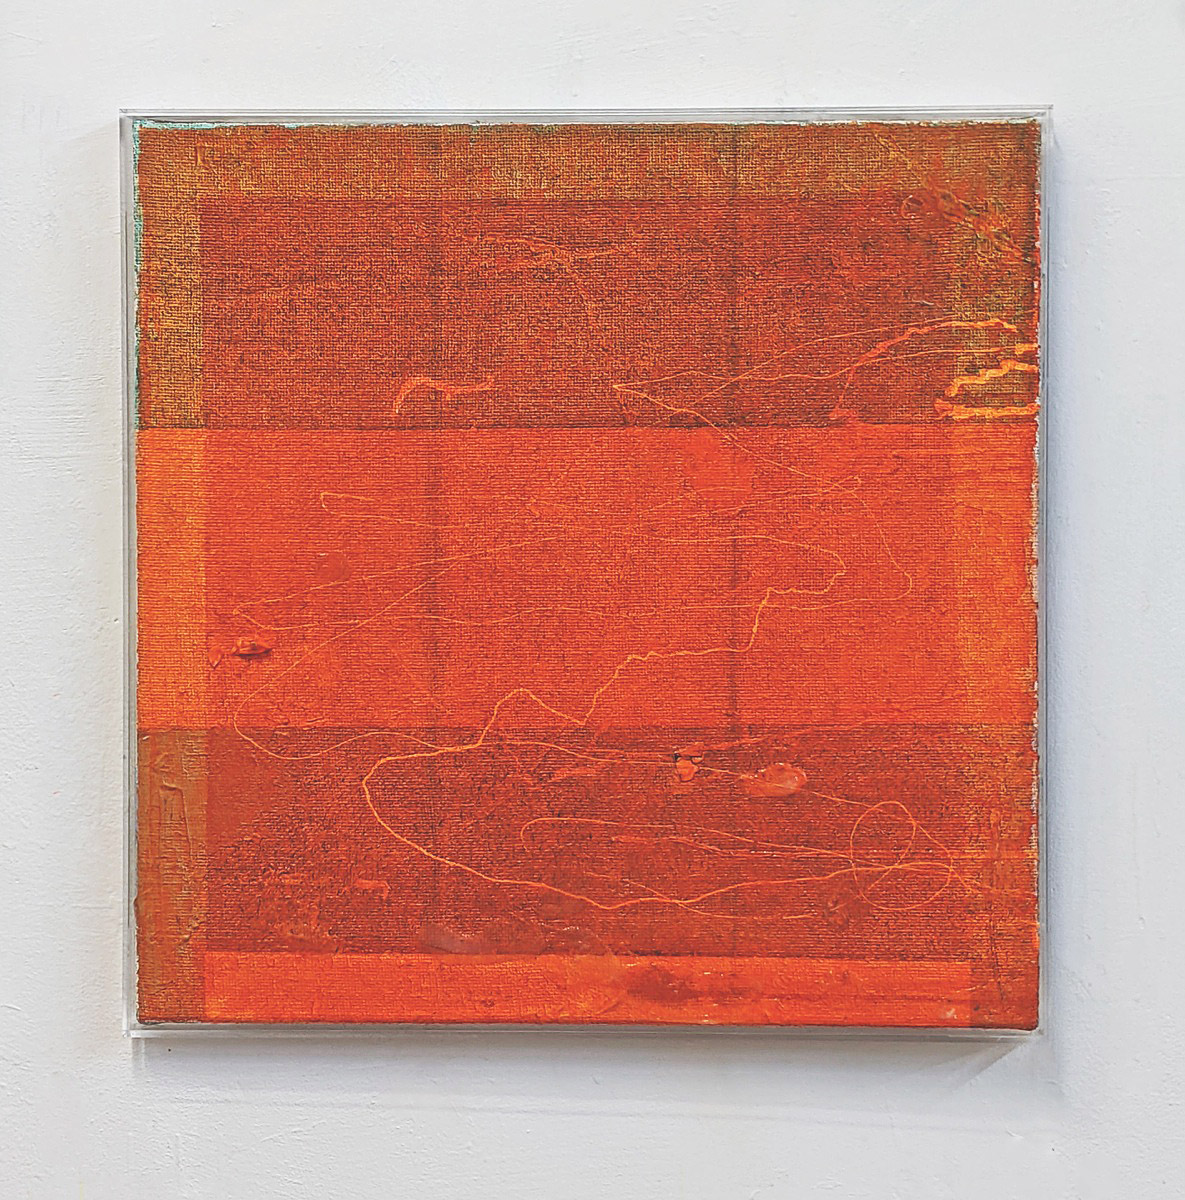 """Verlauf"", 62x62 cm, Acrylfarbe, Jute, Plexirahmen, 2016"